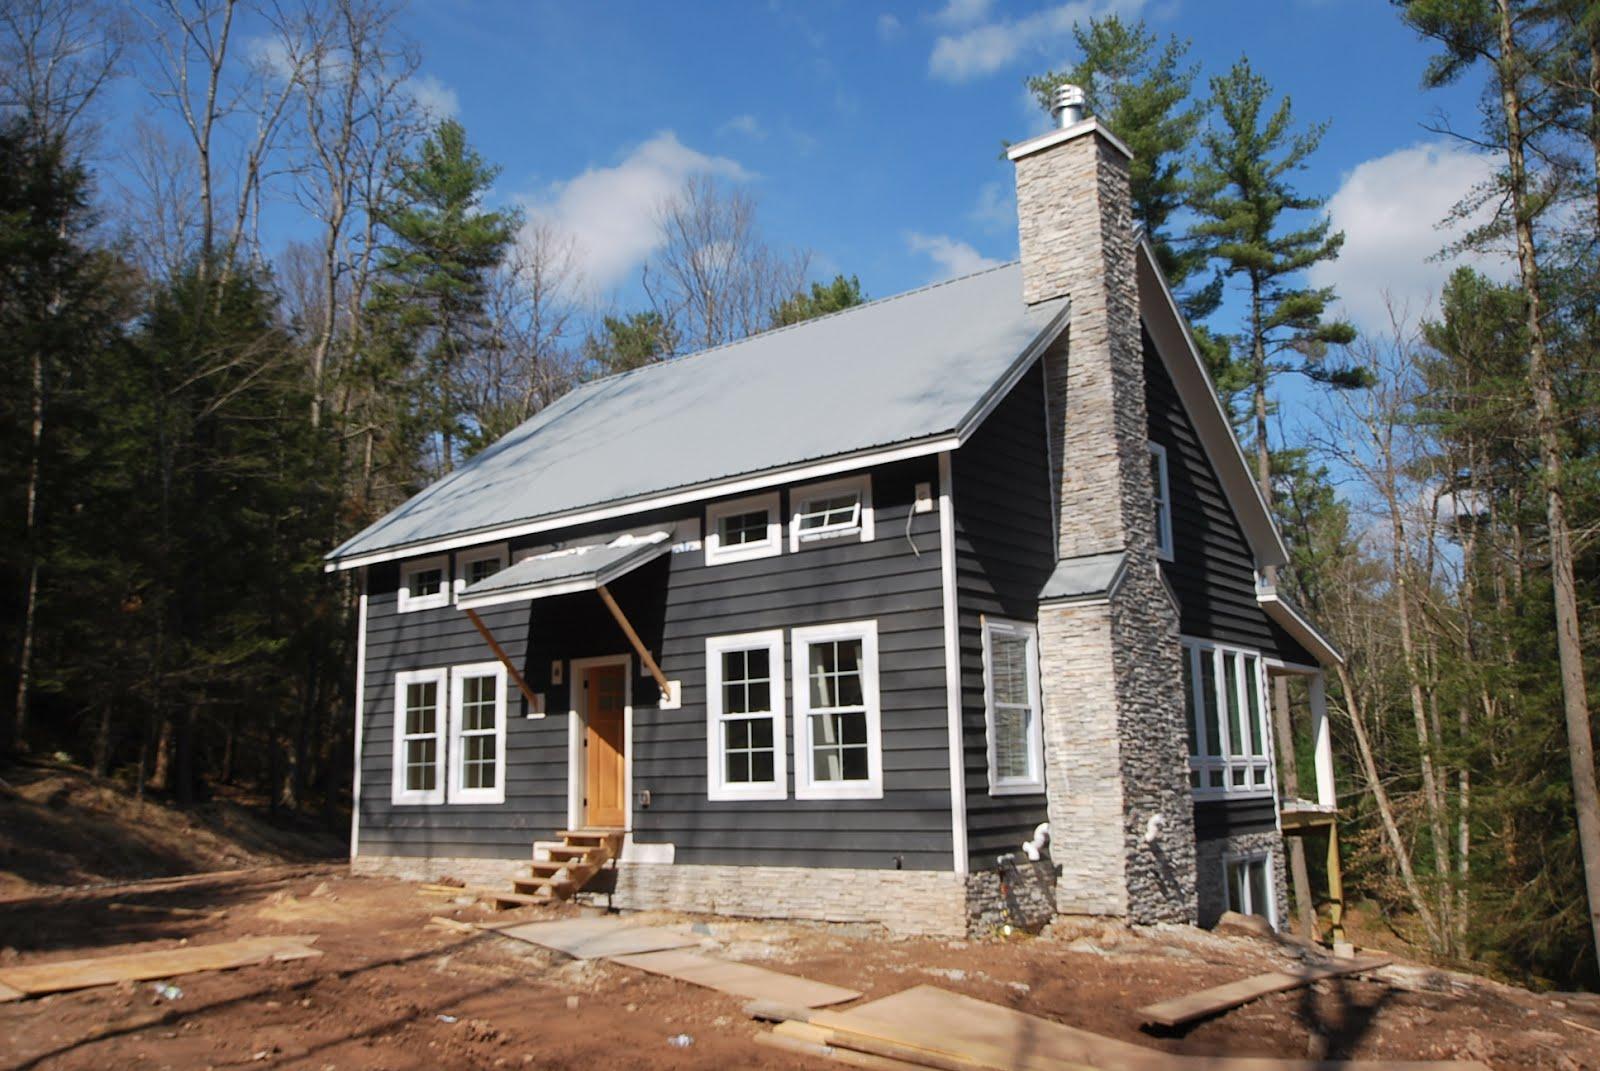 Sullivan County Ulster County Real Estate Catskill Farms Journal Barn 5 Movin